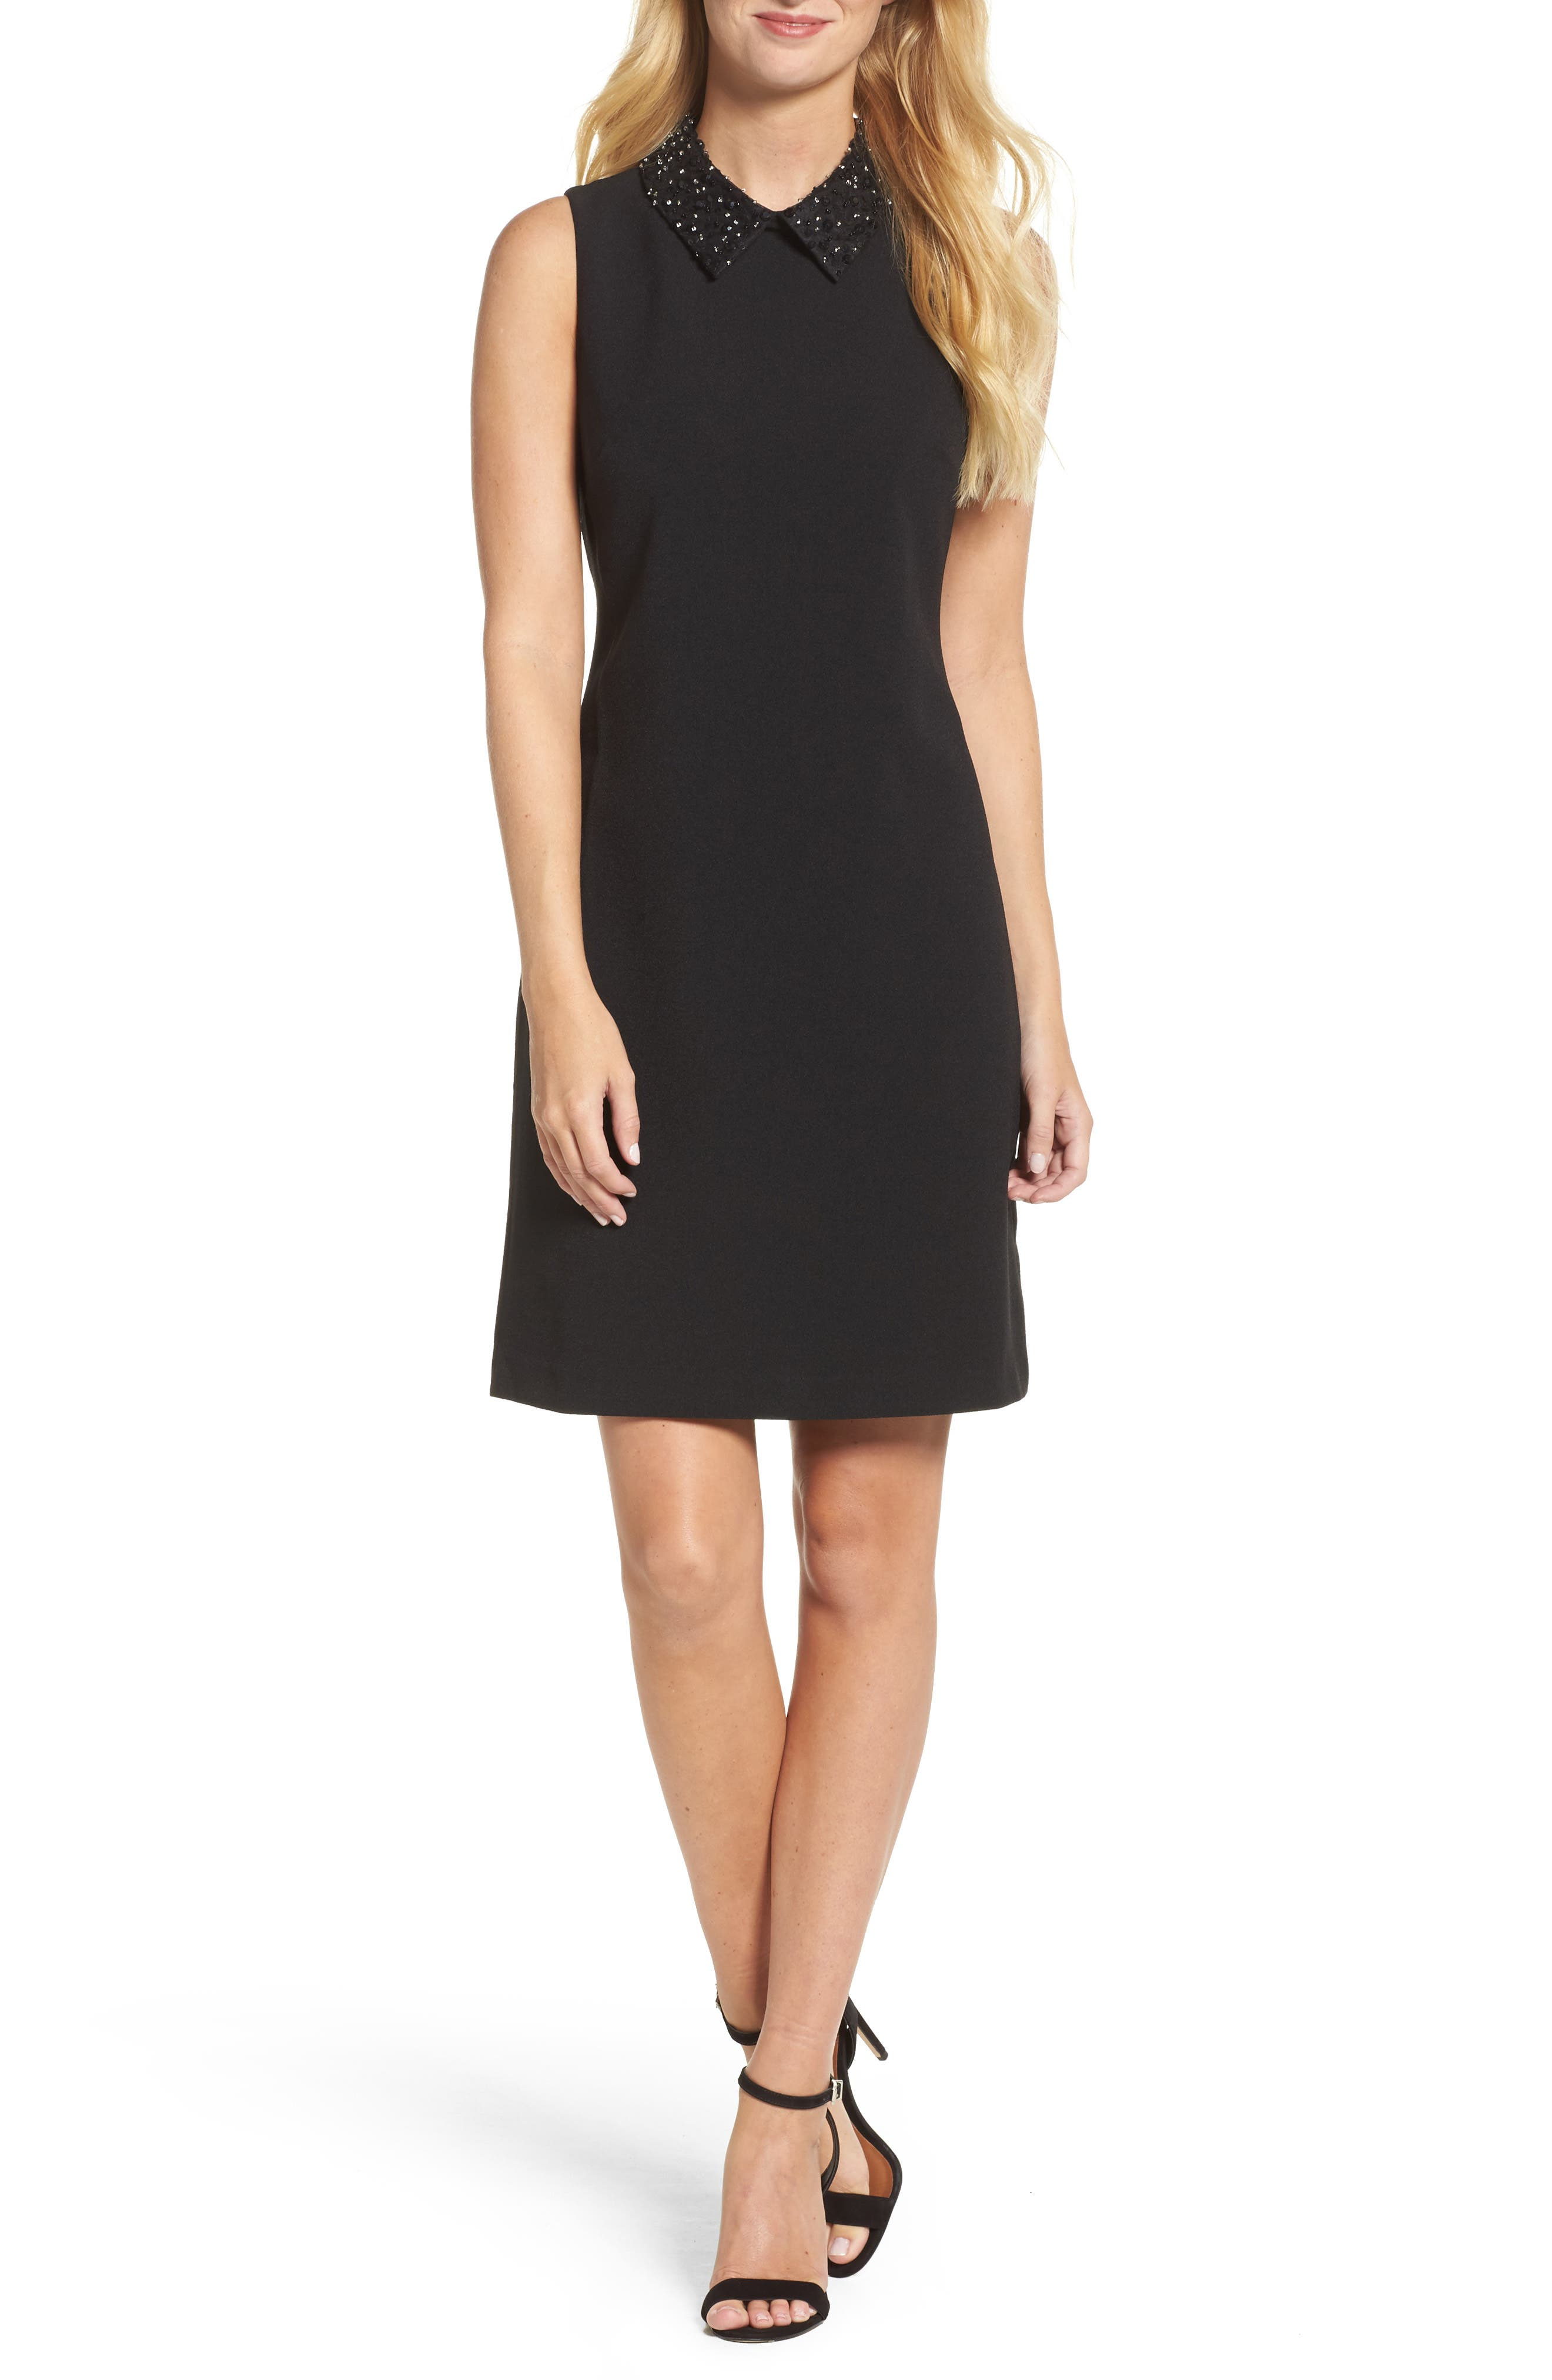 Alternate Image 1 Selected - Julia Jordan Jeweled Collar A-Line Dress